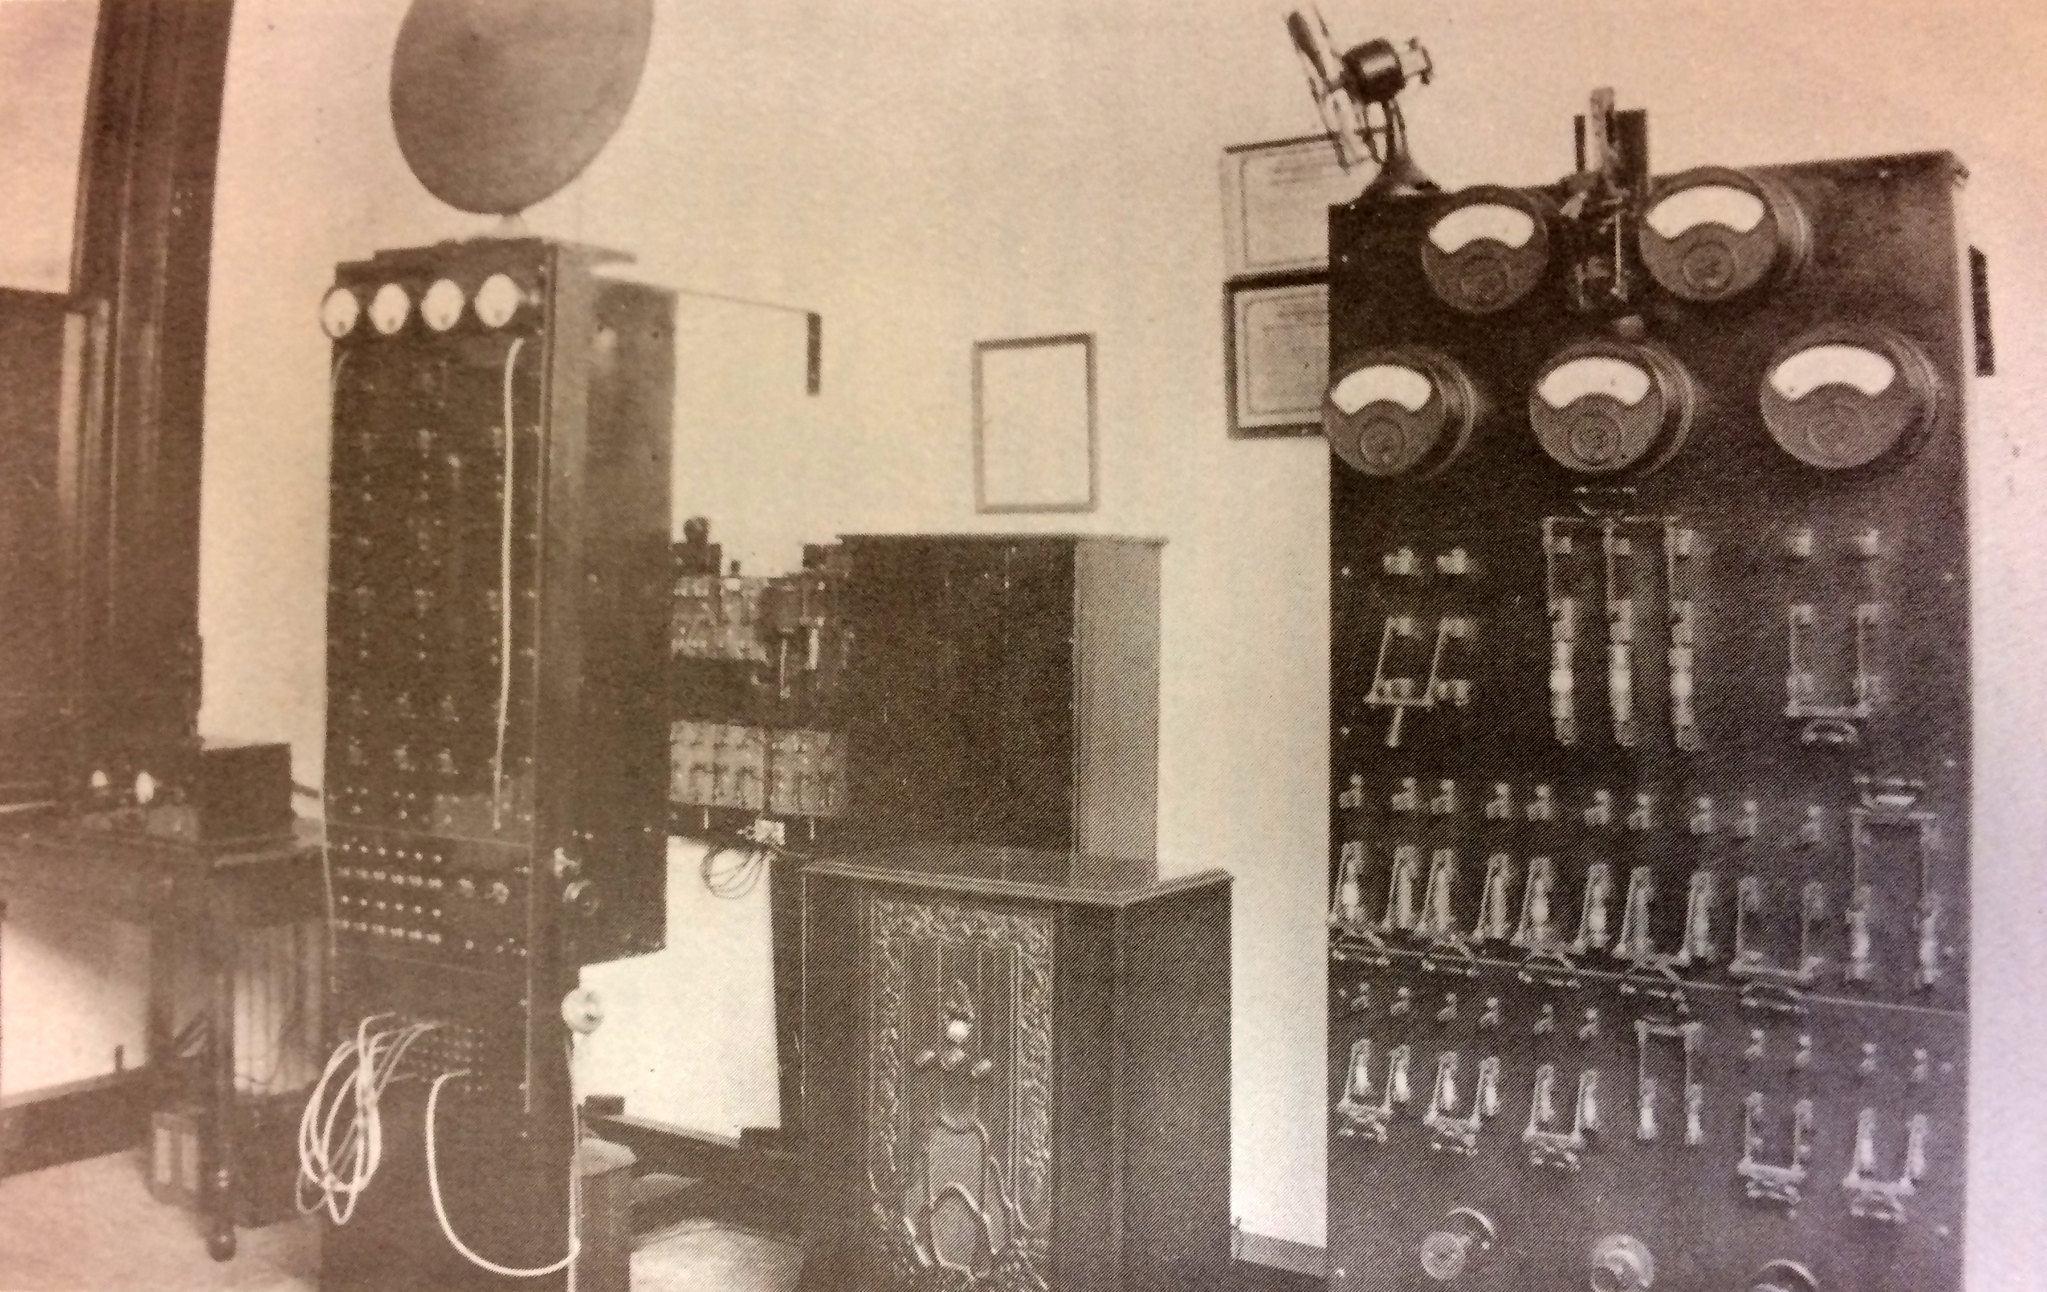 WWL-transmitter